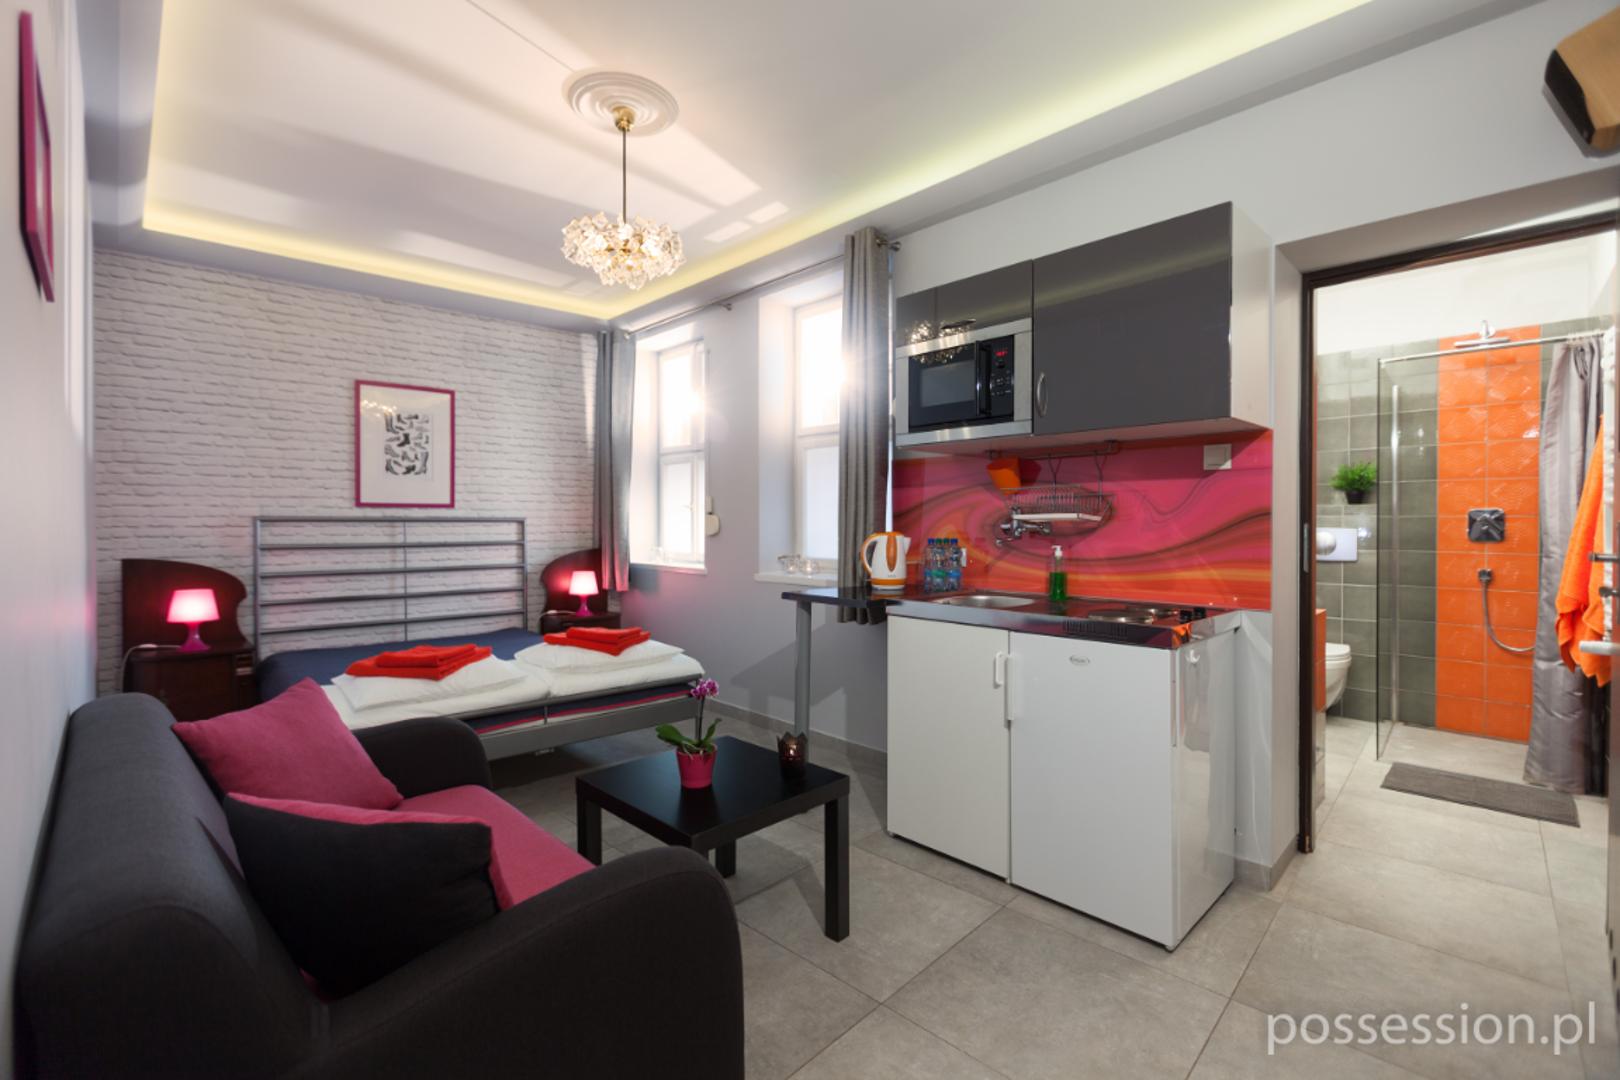 Apartments www.possession.pl